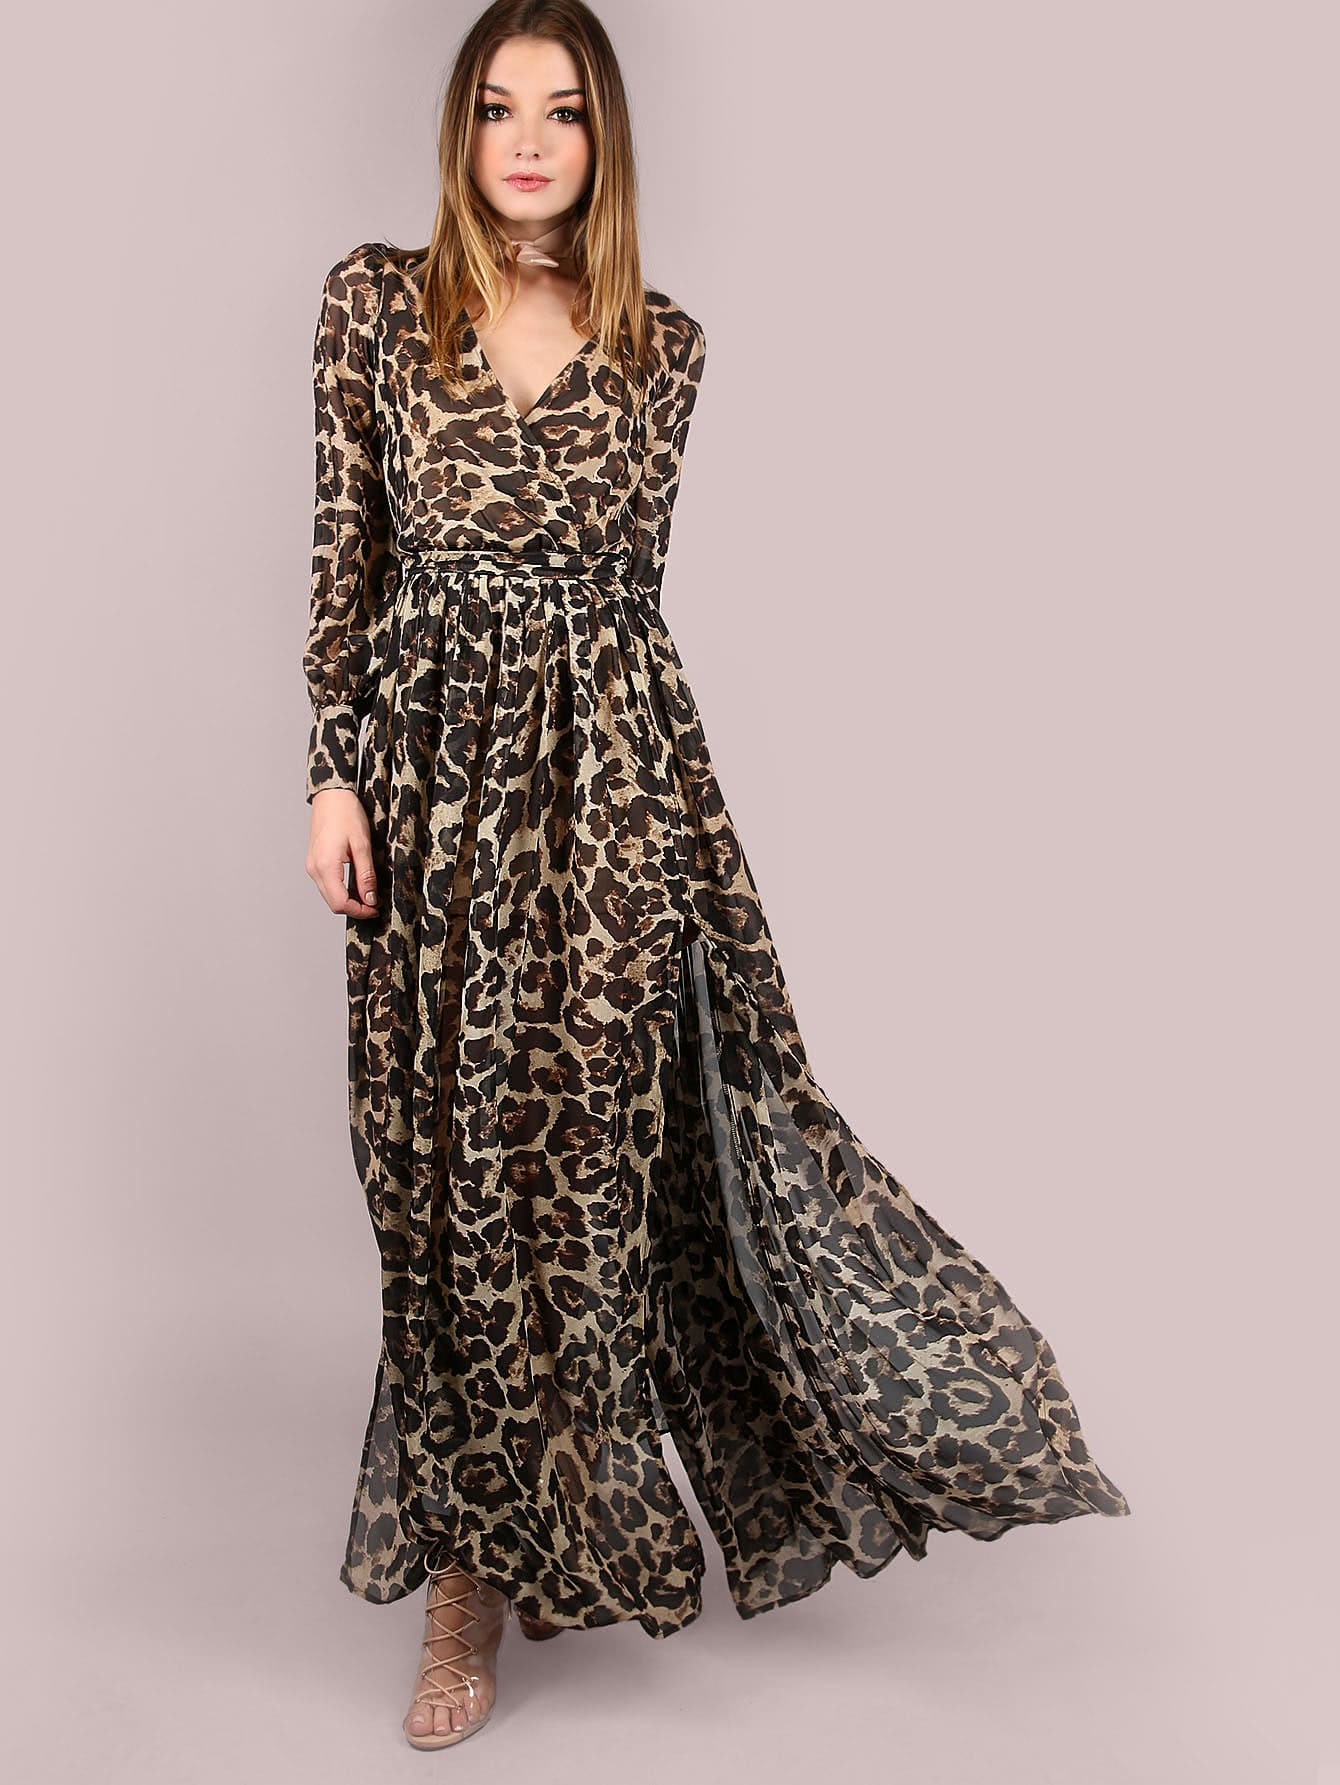 Leopard Print Surplice Neckline Chiffon Dress